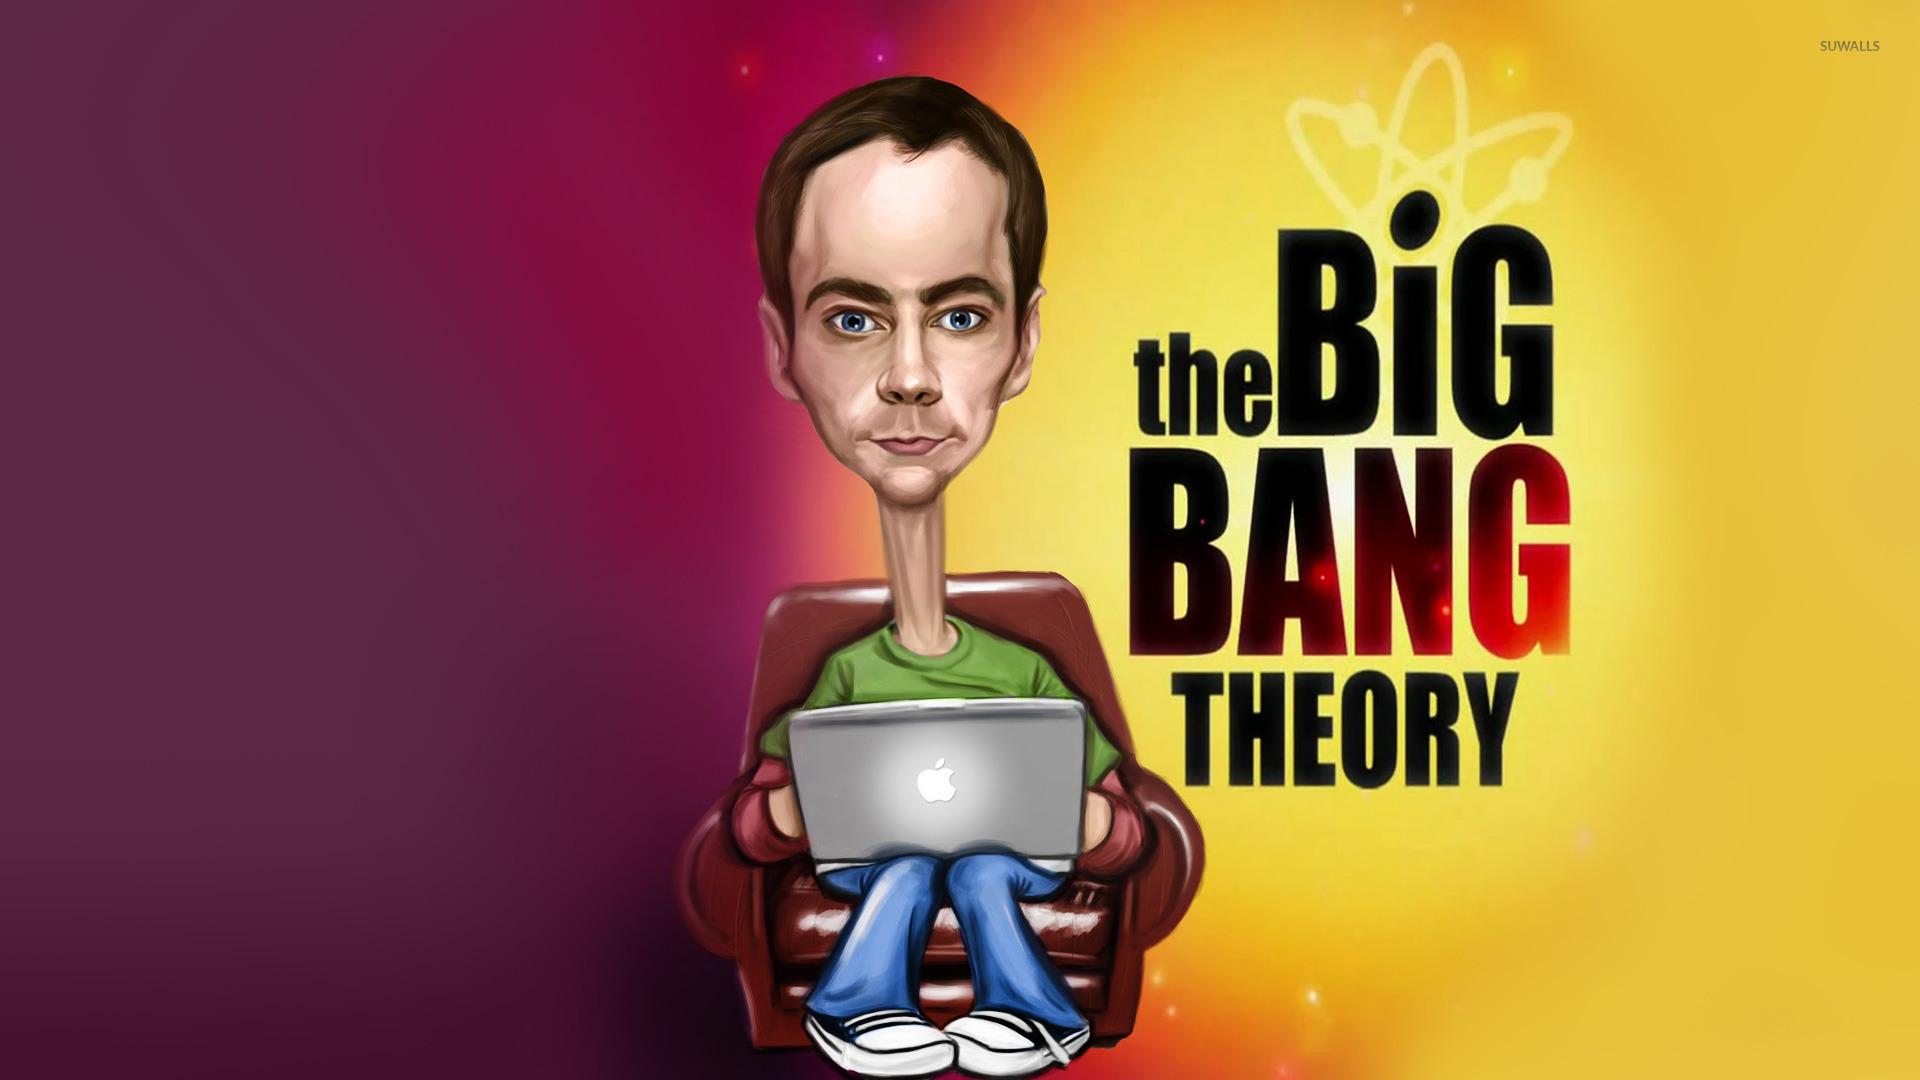 Protagonismo 'freaky', 'geek' o 'nerd'?: Sheldon Cooper»